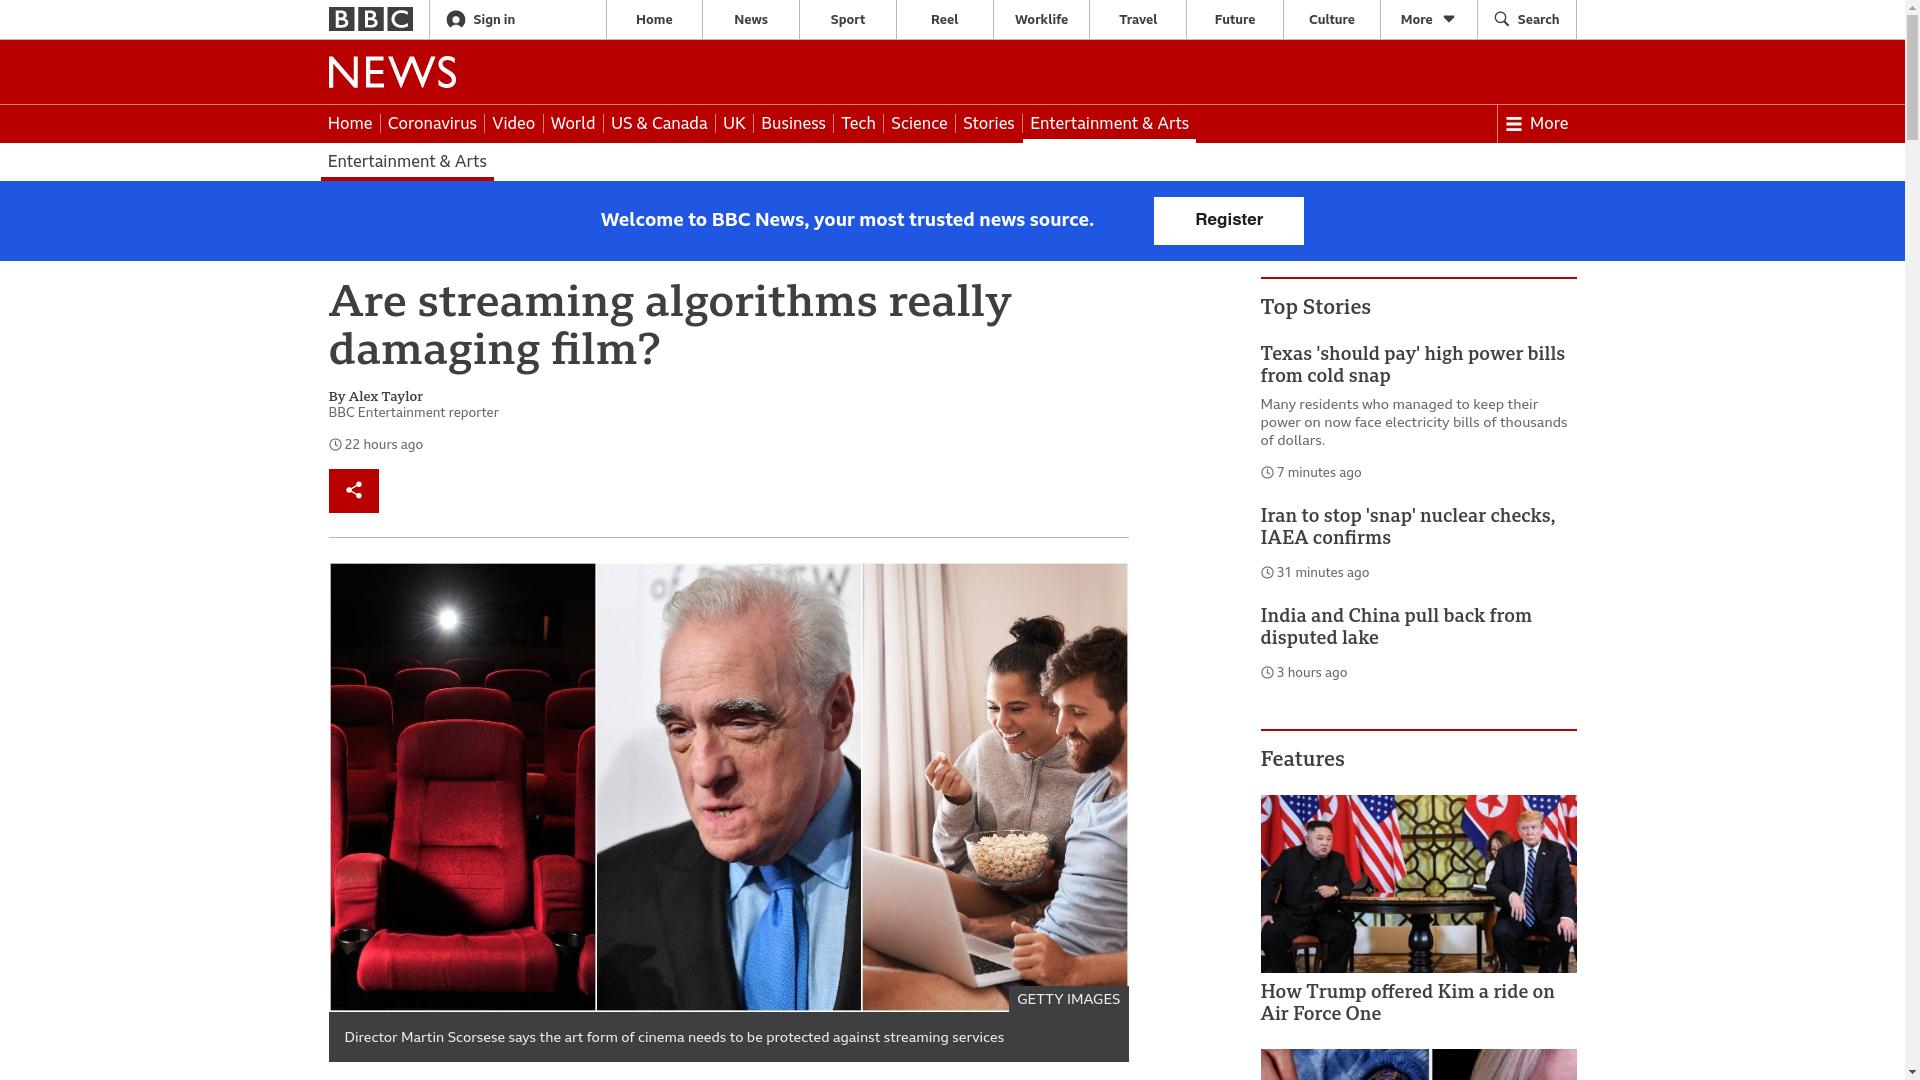 Fairness Rocks News Are streaming algorithms really damaging film?